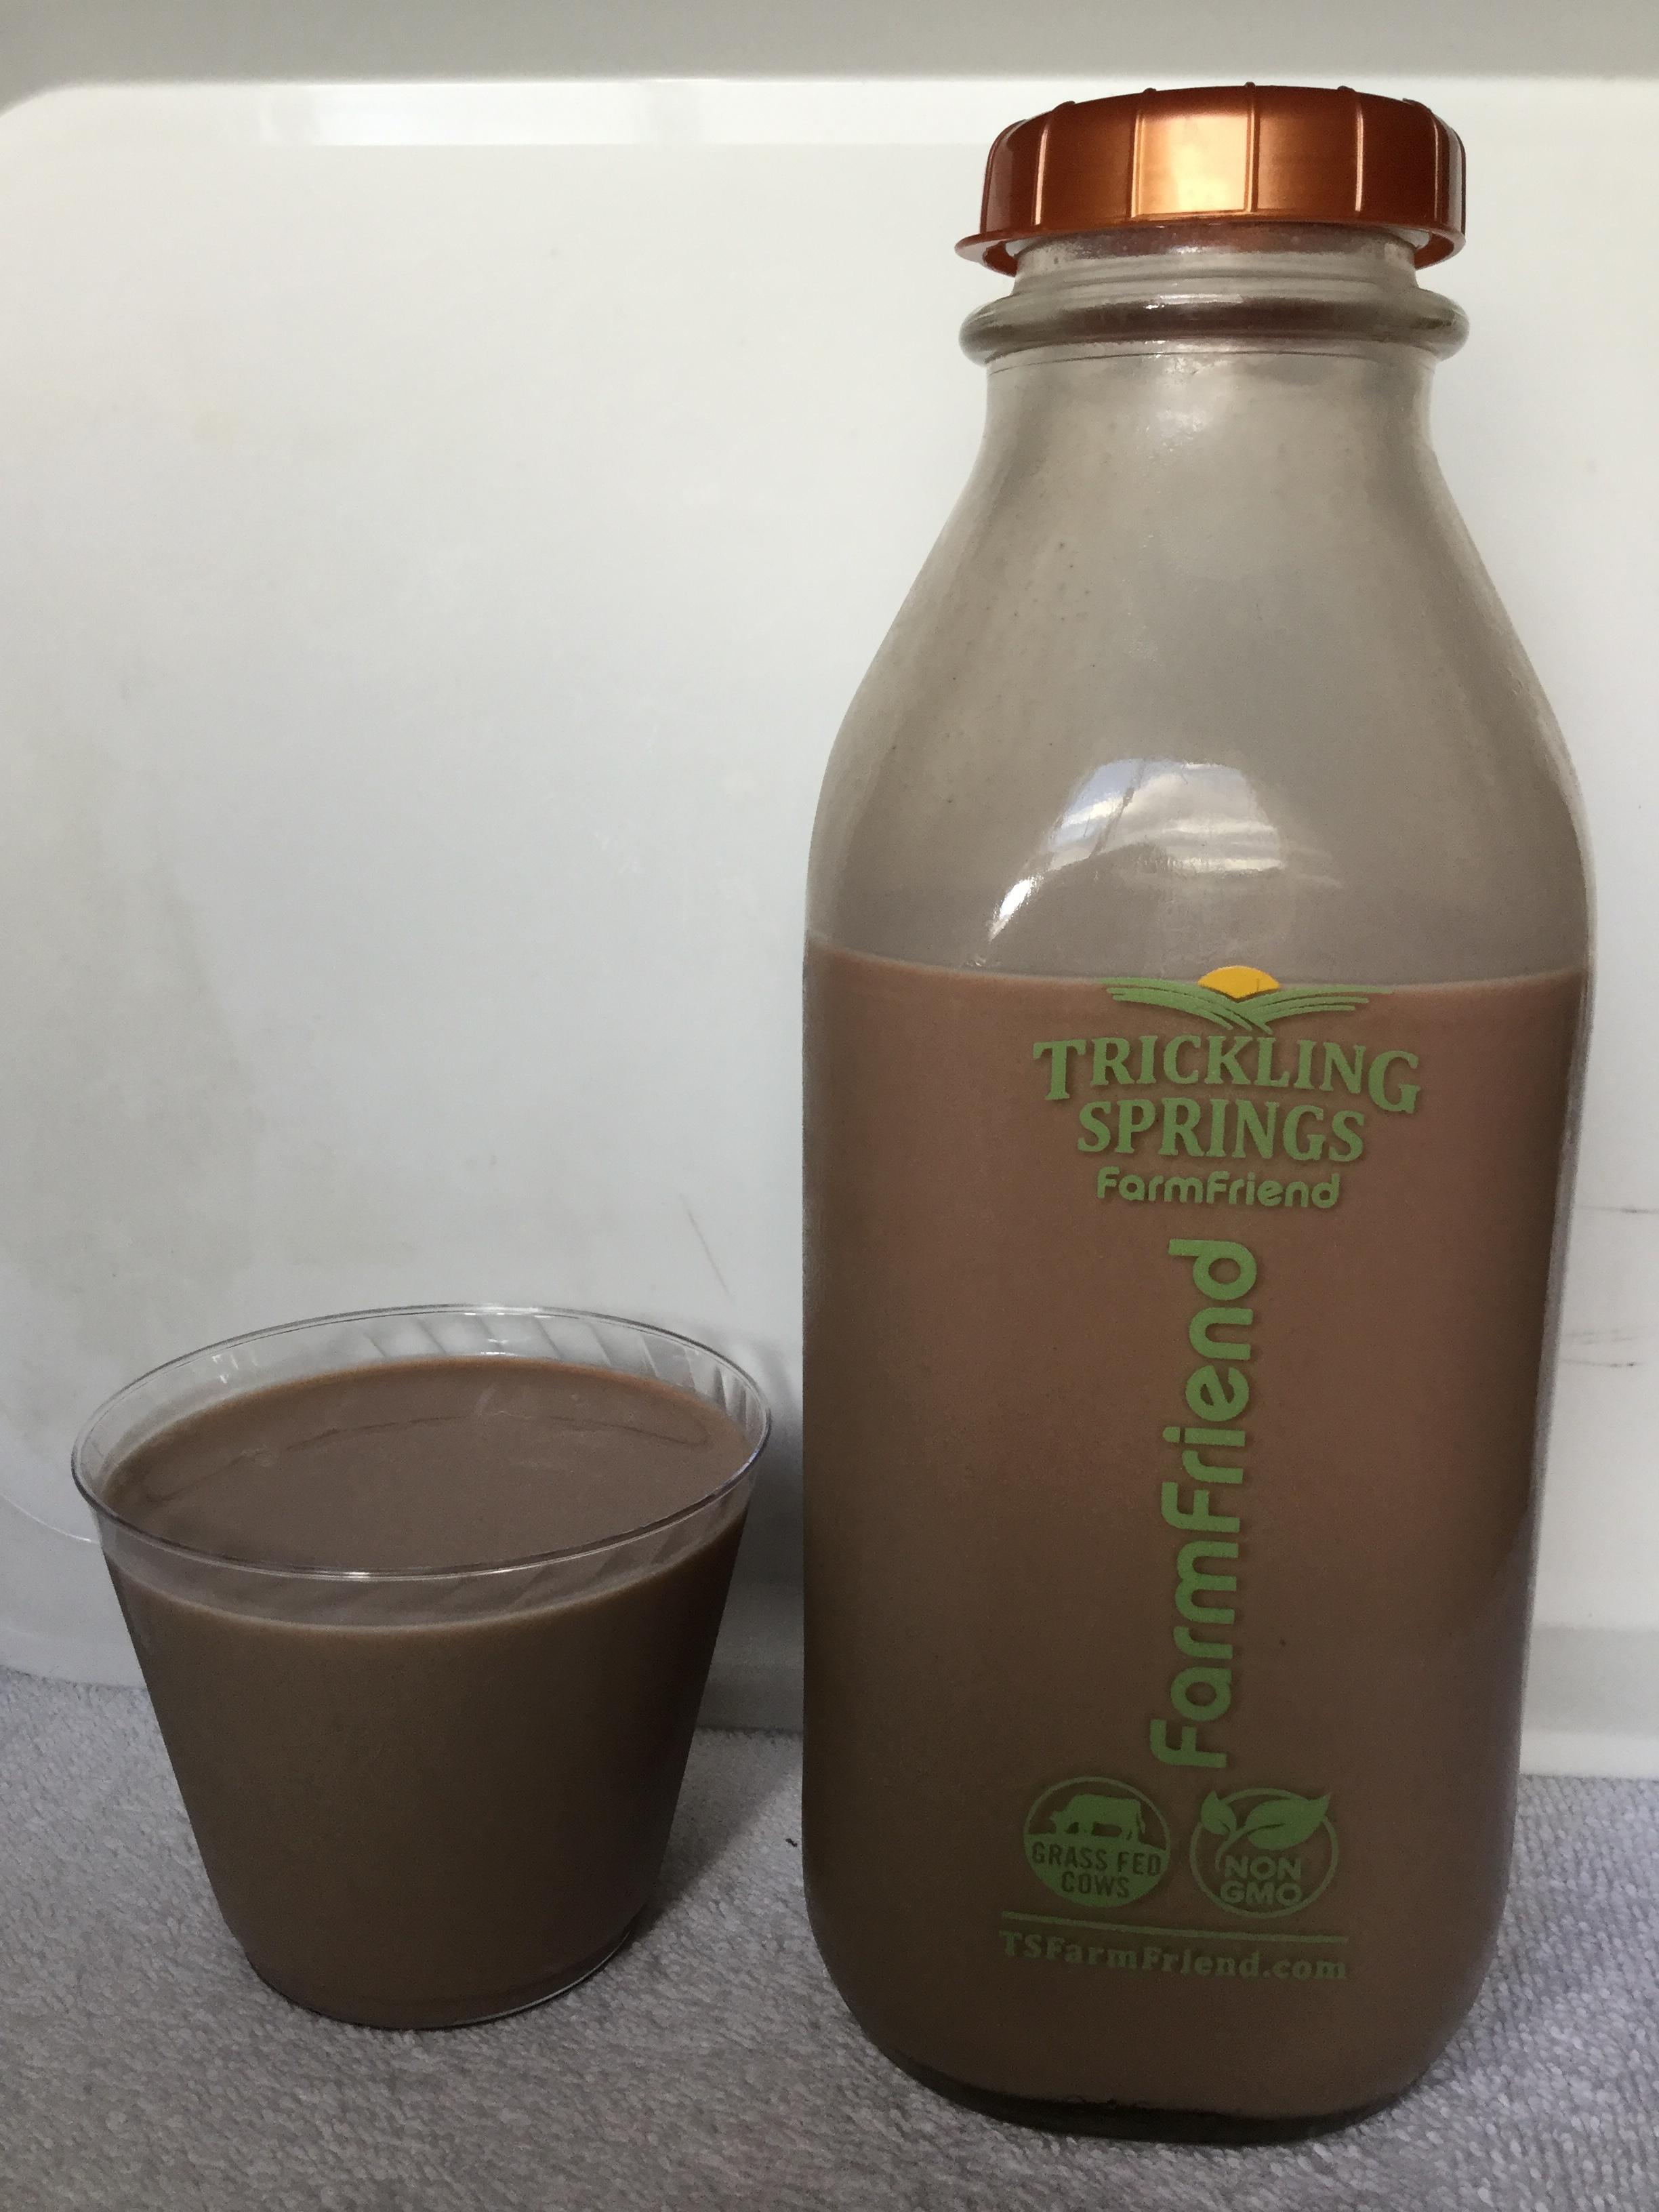 Trickling Springs FarmFriend Chocolate Milk Cup